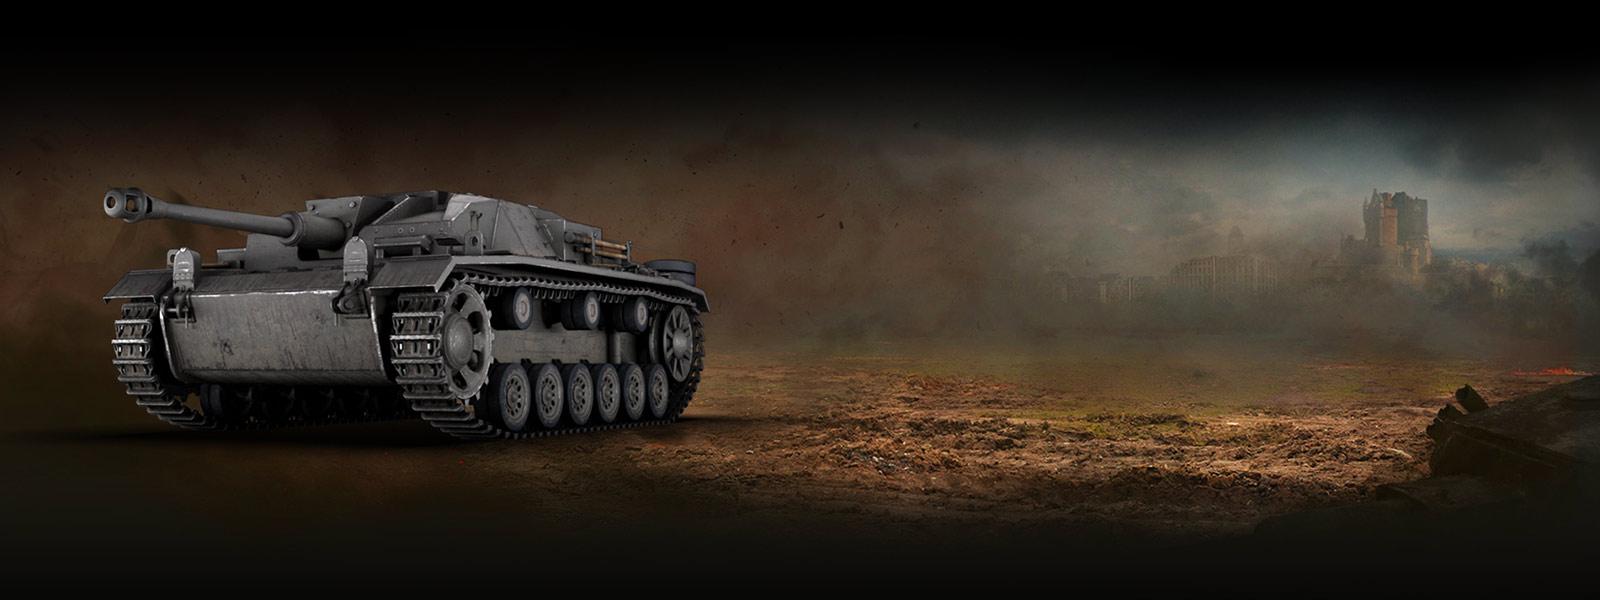 Tank destroyer class tank